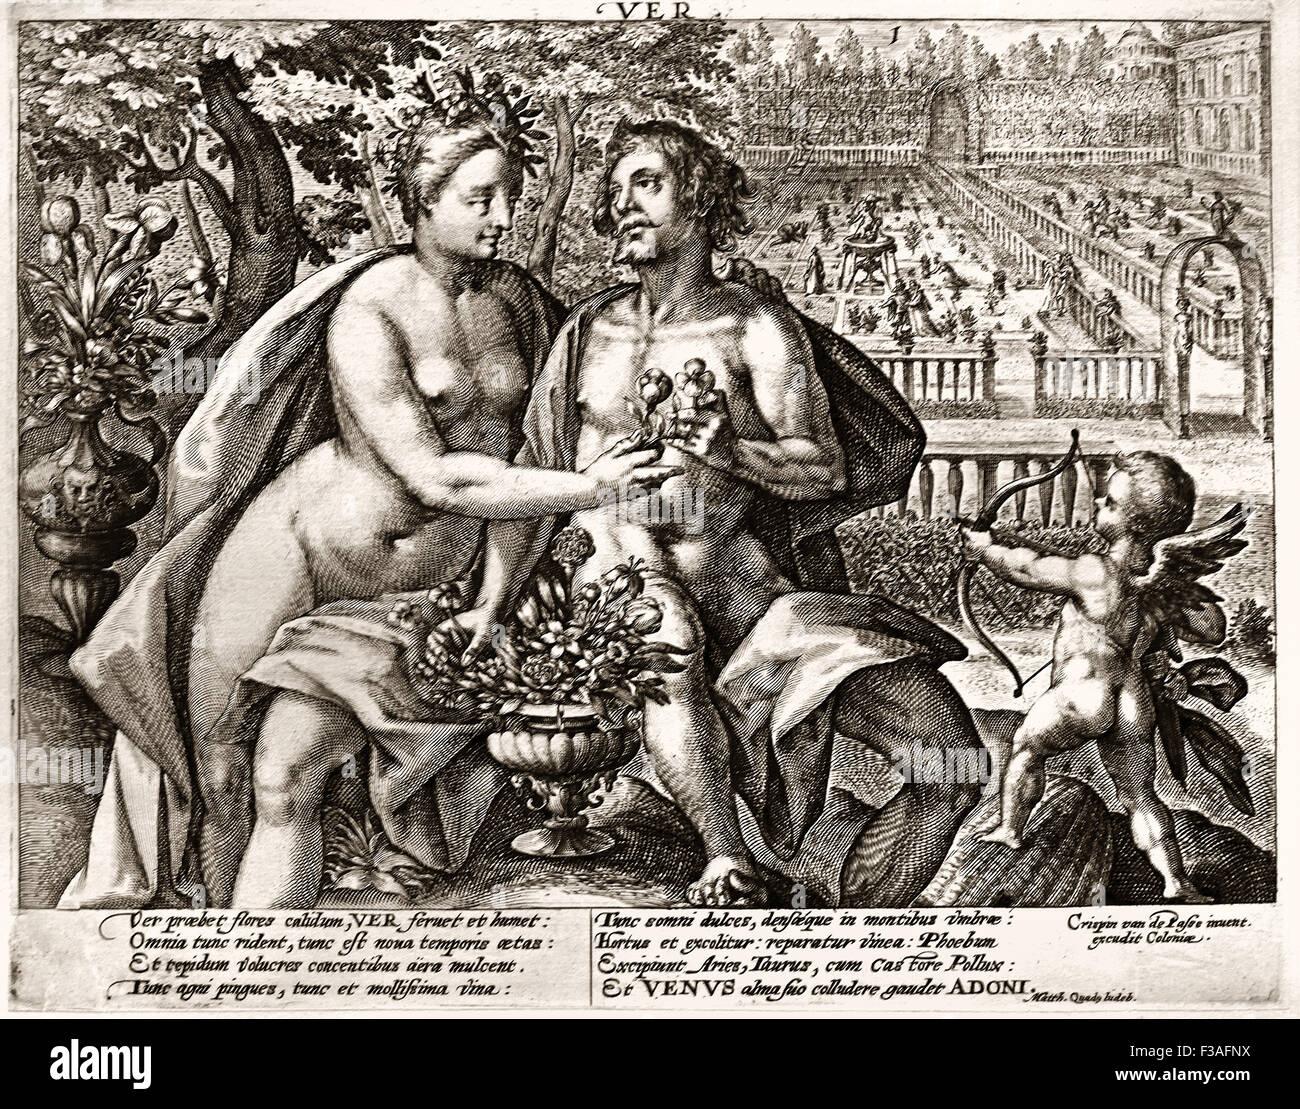 Primavera 1614 Crispijn van de Passe 1 ( 1564 - 1637 ) Holanda Holandesa grabado Imagen De Stock